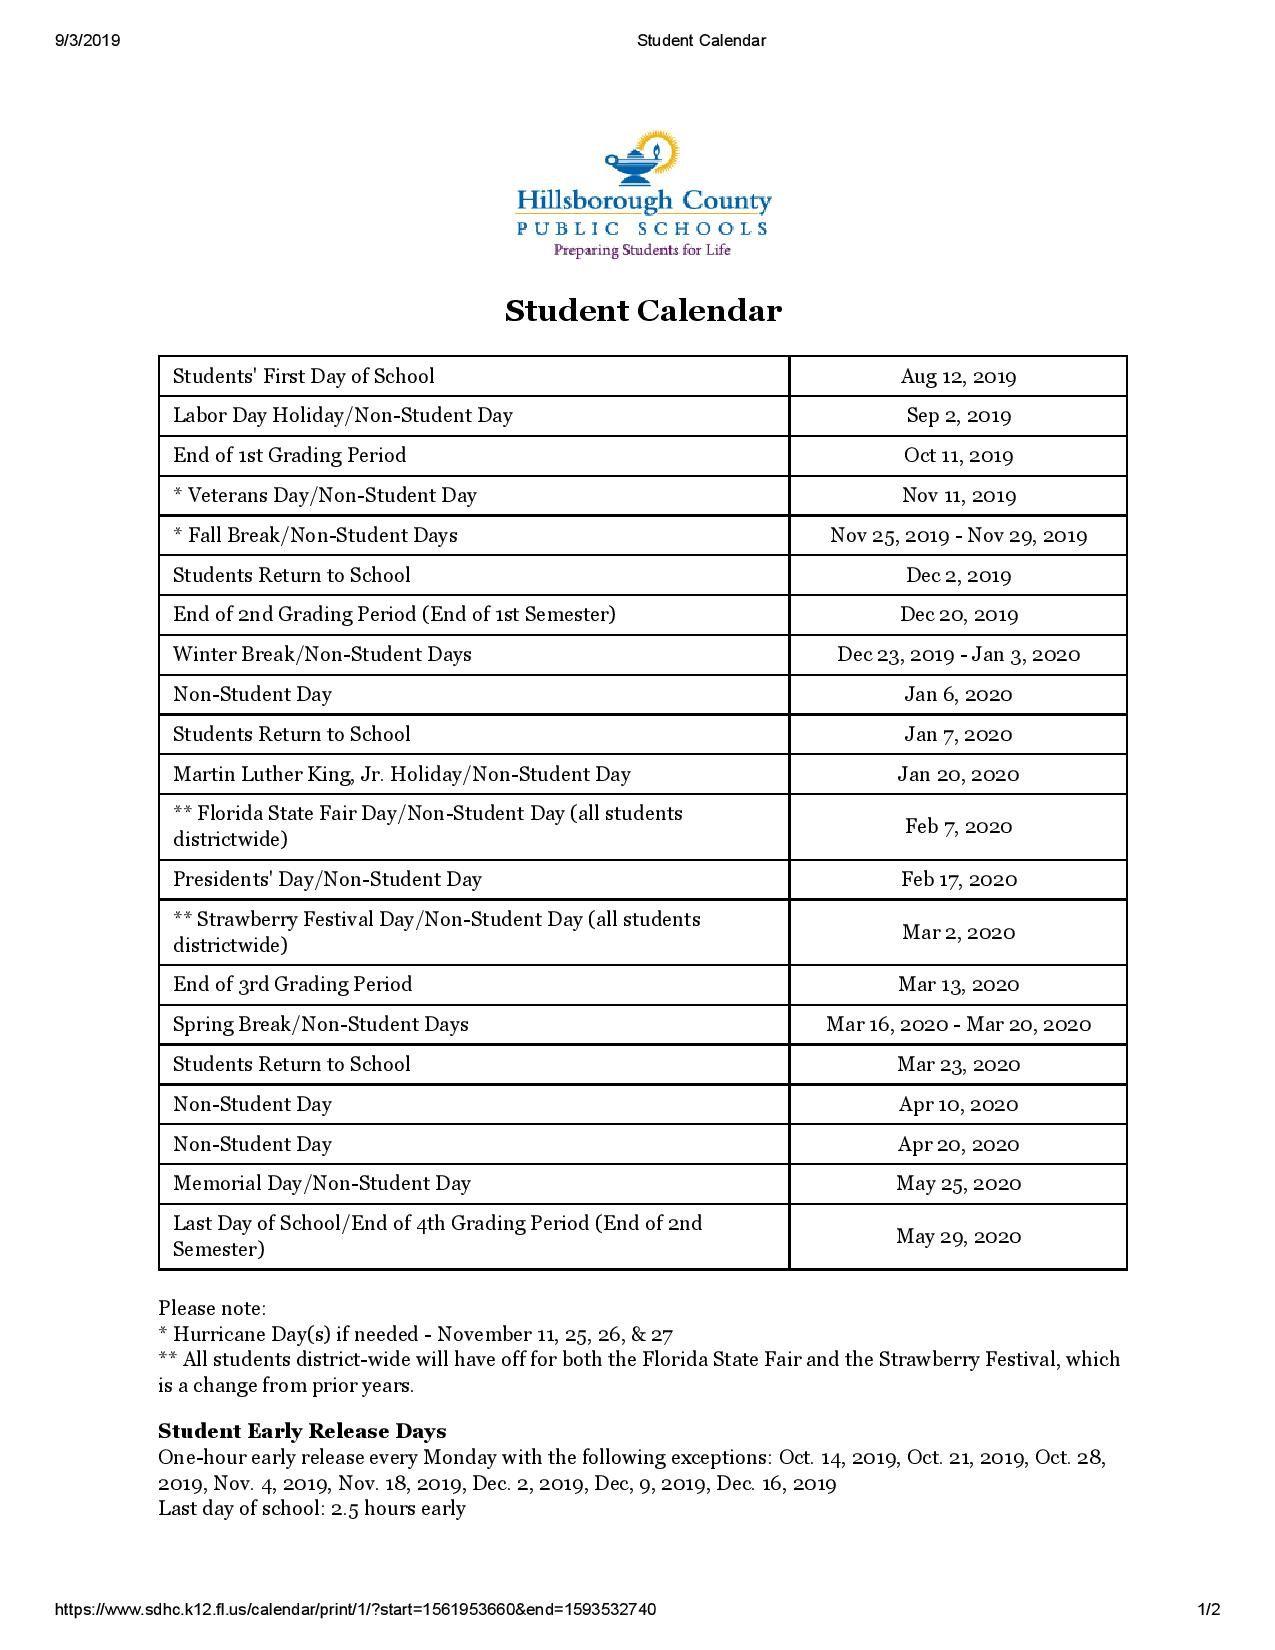 Hillsborough County School Calendar You Calendars Https Www Youcalendars Com Hillsborough County School Cal School Calendar Student Calendar Students Day